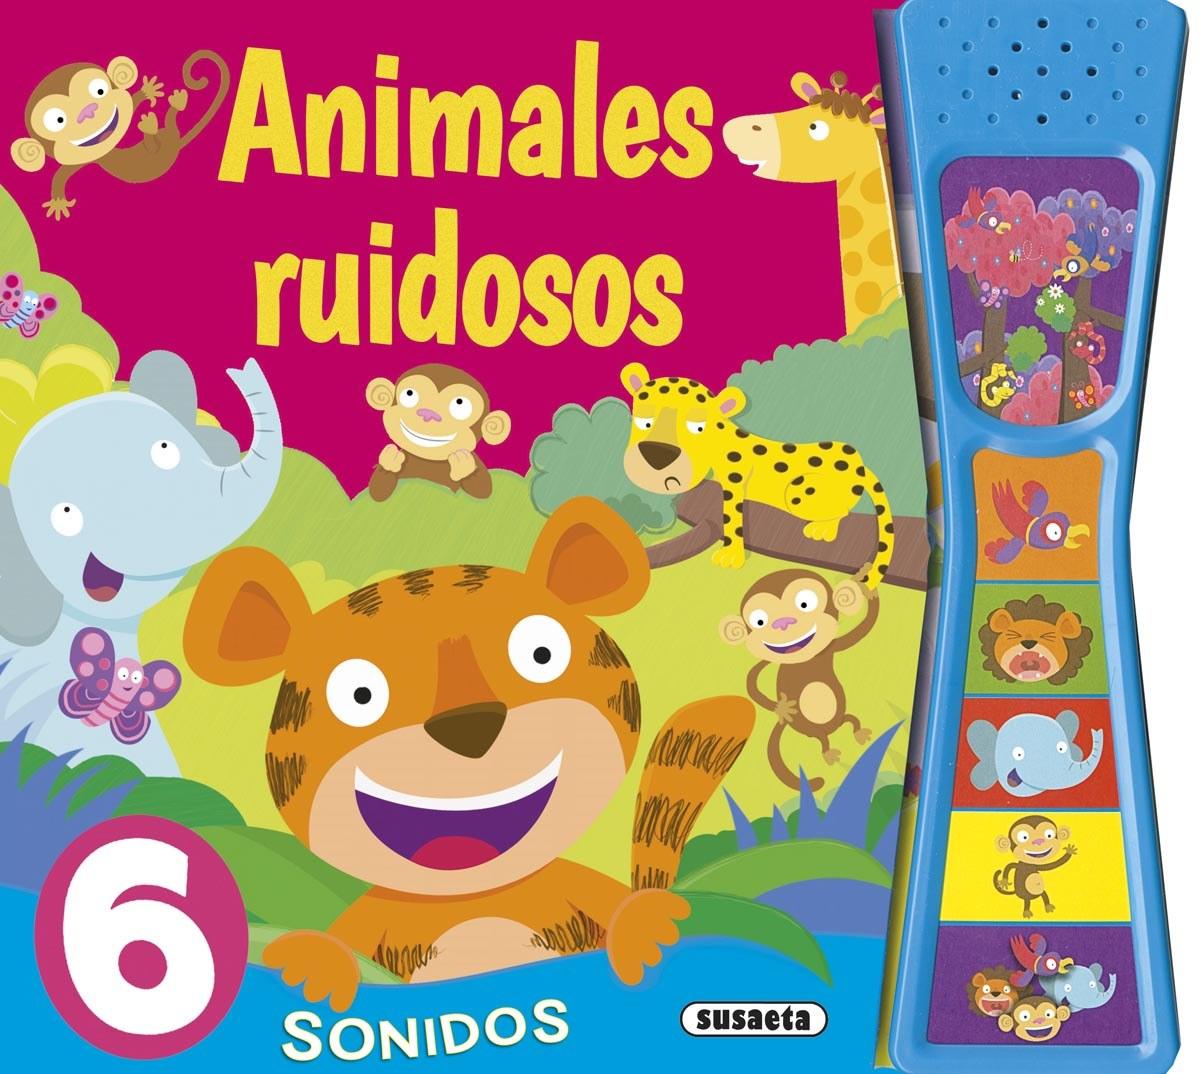 Animales ruidosos 9788467741391